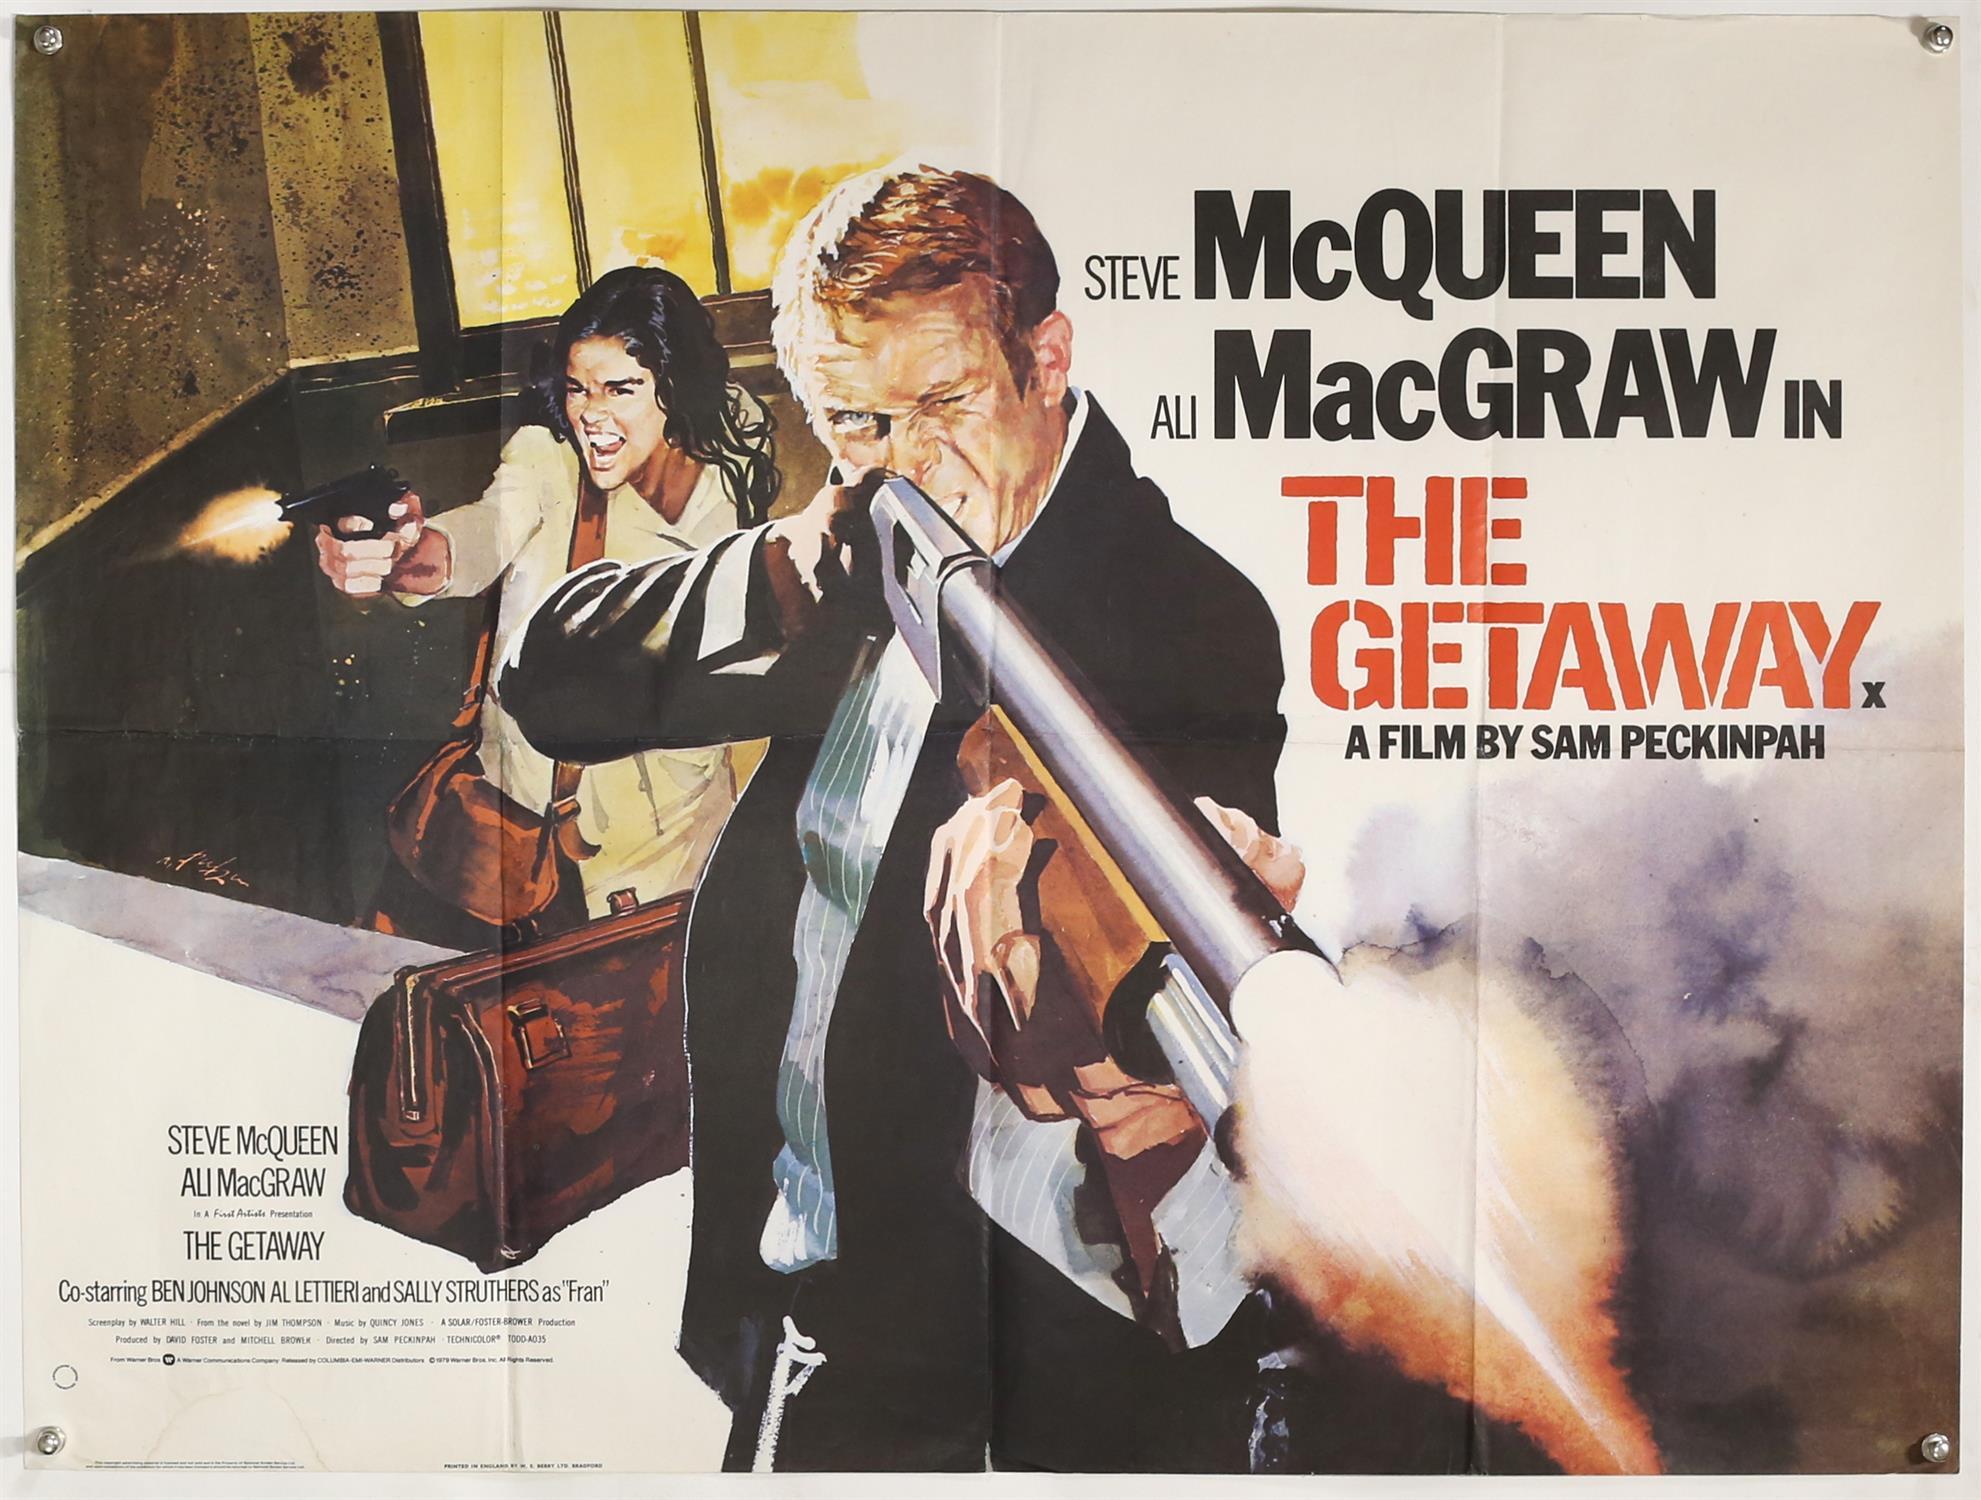 The Getaway (R-1979) British Quad film poster, artwork by Arnaldo Putzu, starring Steve McQueen,